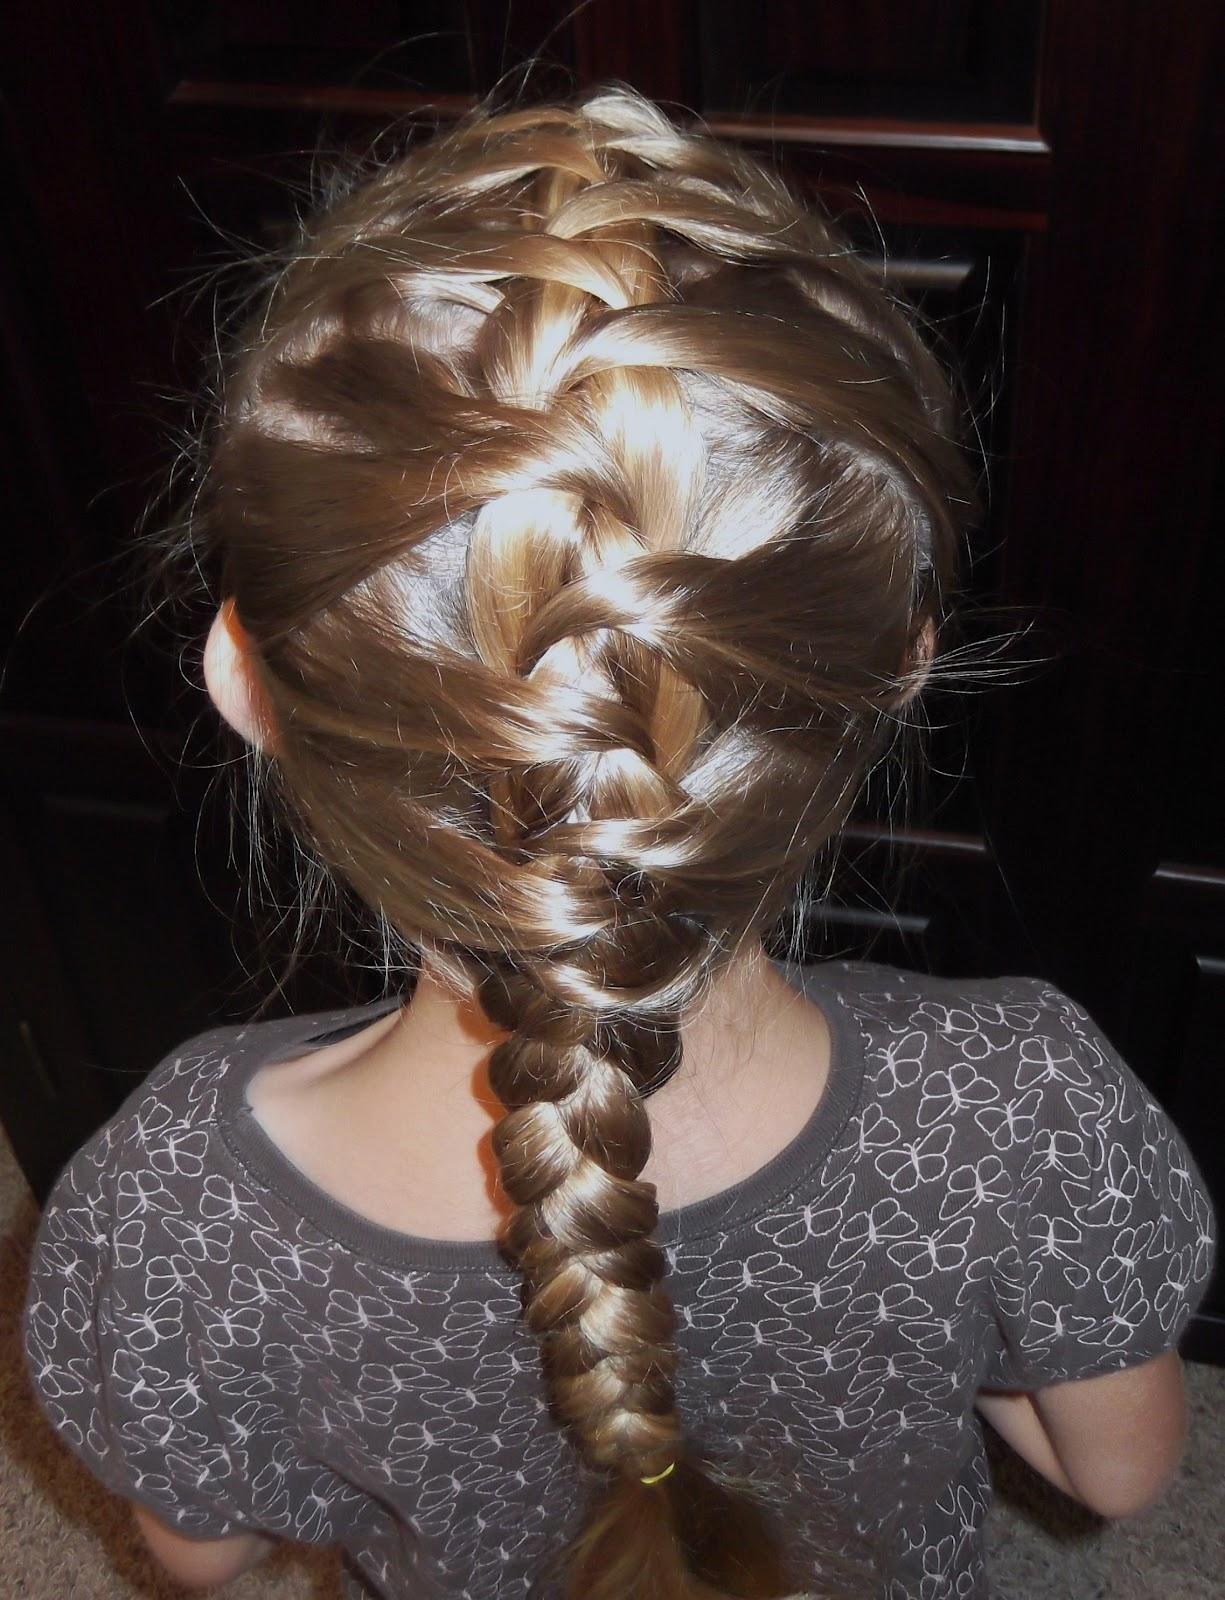 Stupendous Pretty Hair Is Fun Girls Hairstyle Tutorials Little Girls Short Hairstyles For Black Women Fulllsitofus